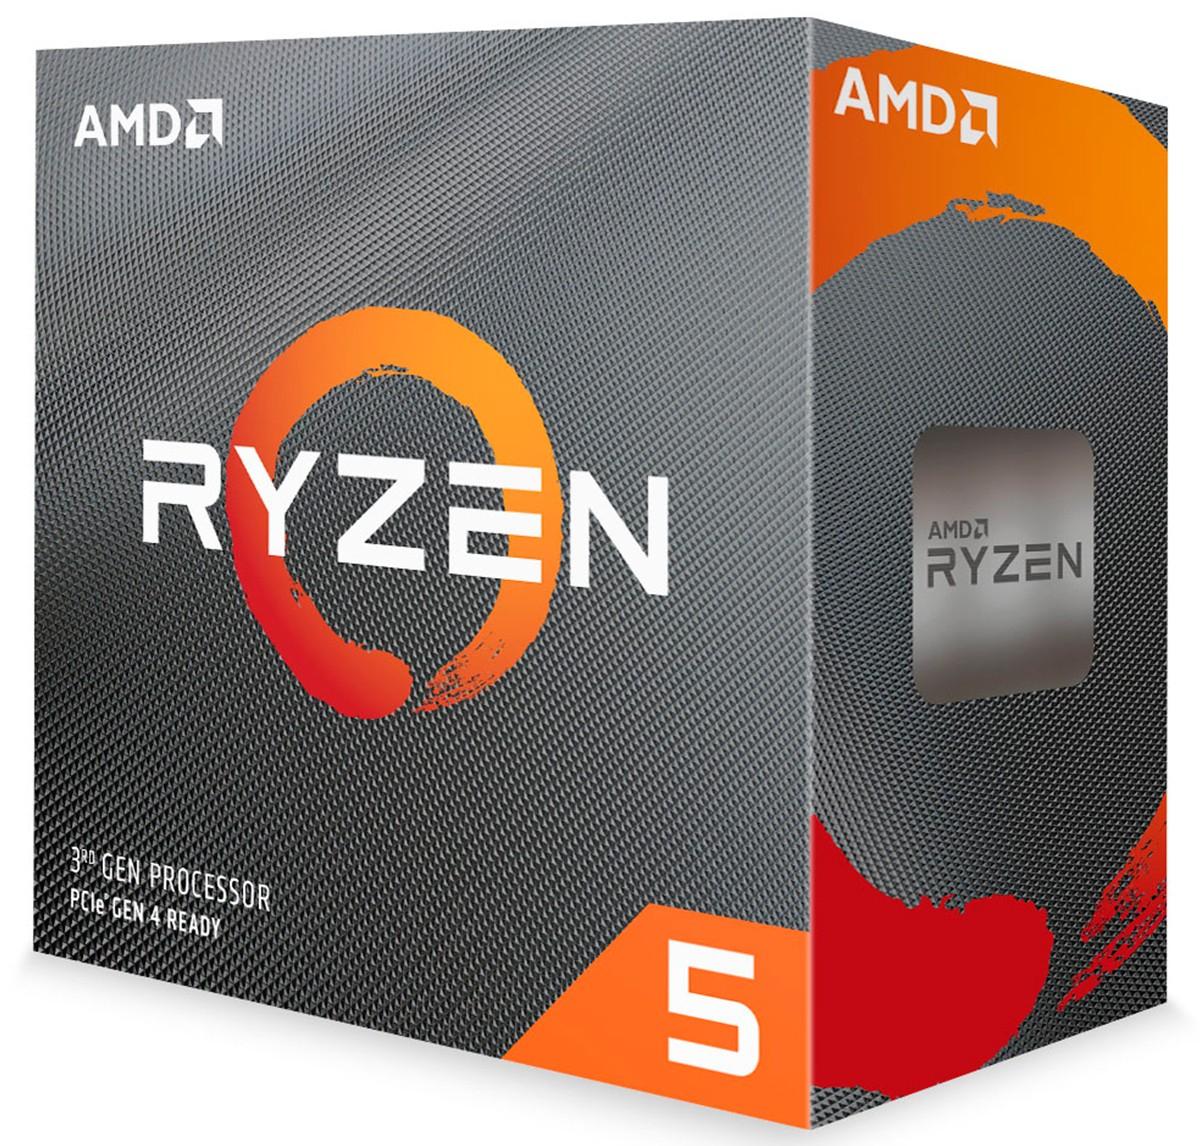 Cashback de hasta 200€ en placas Gigabyte + CPU AMD